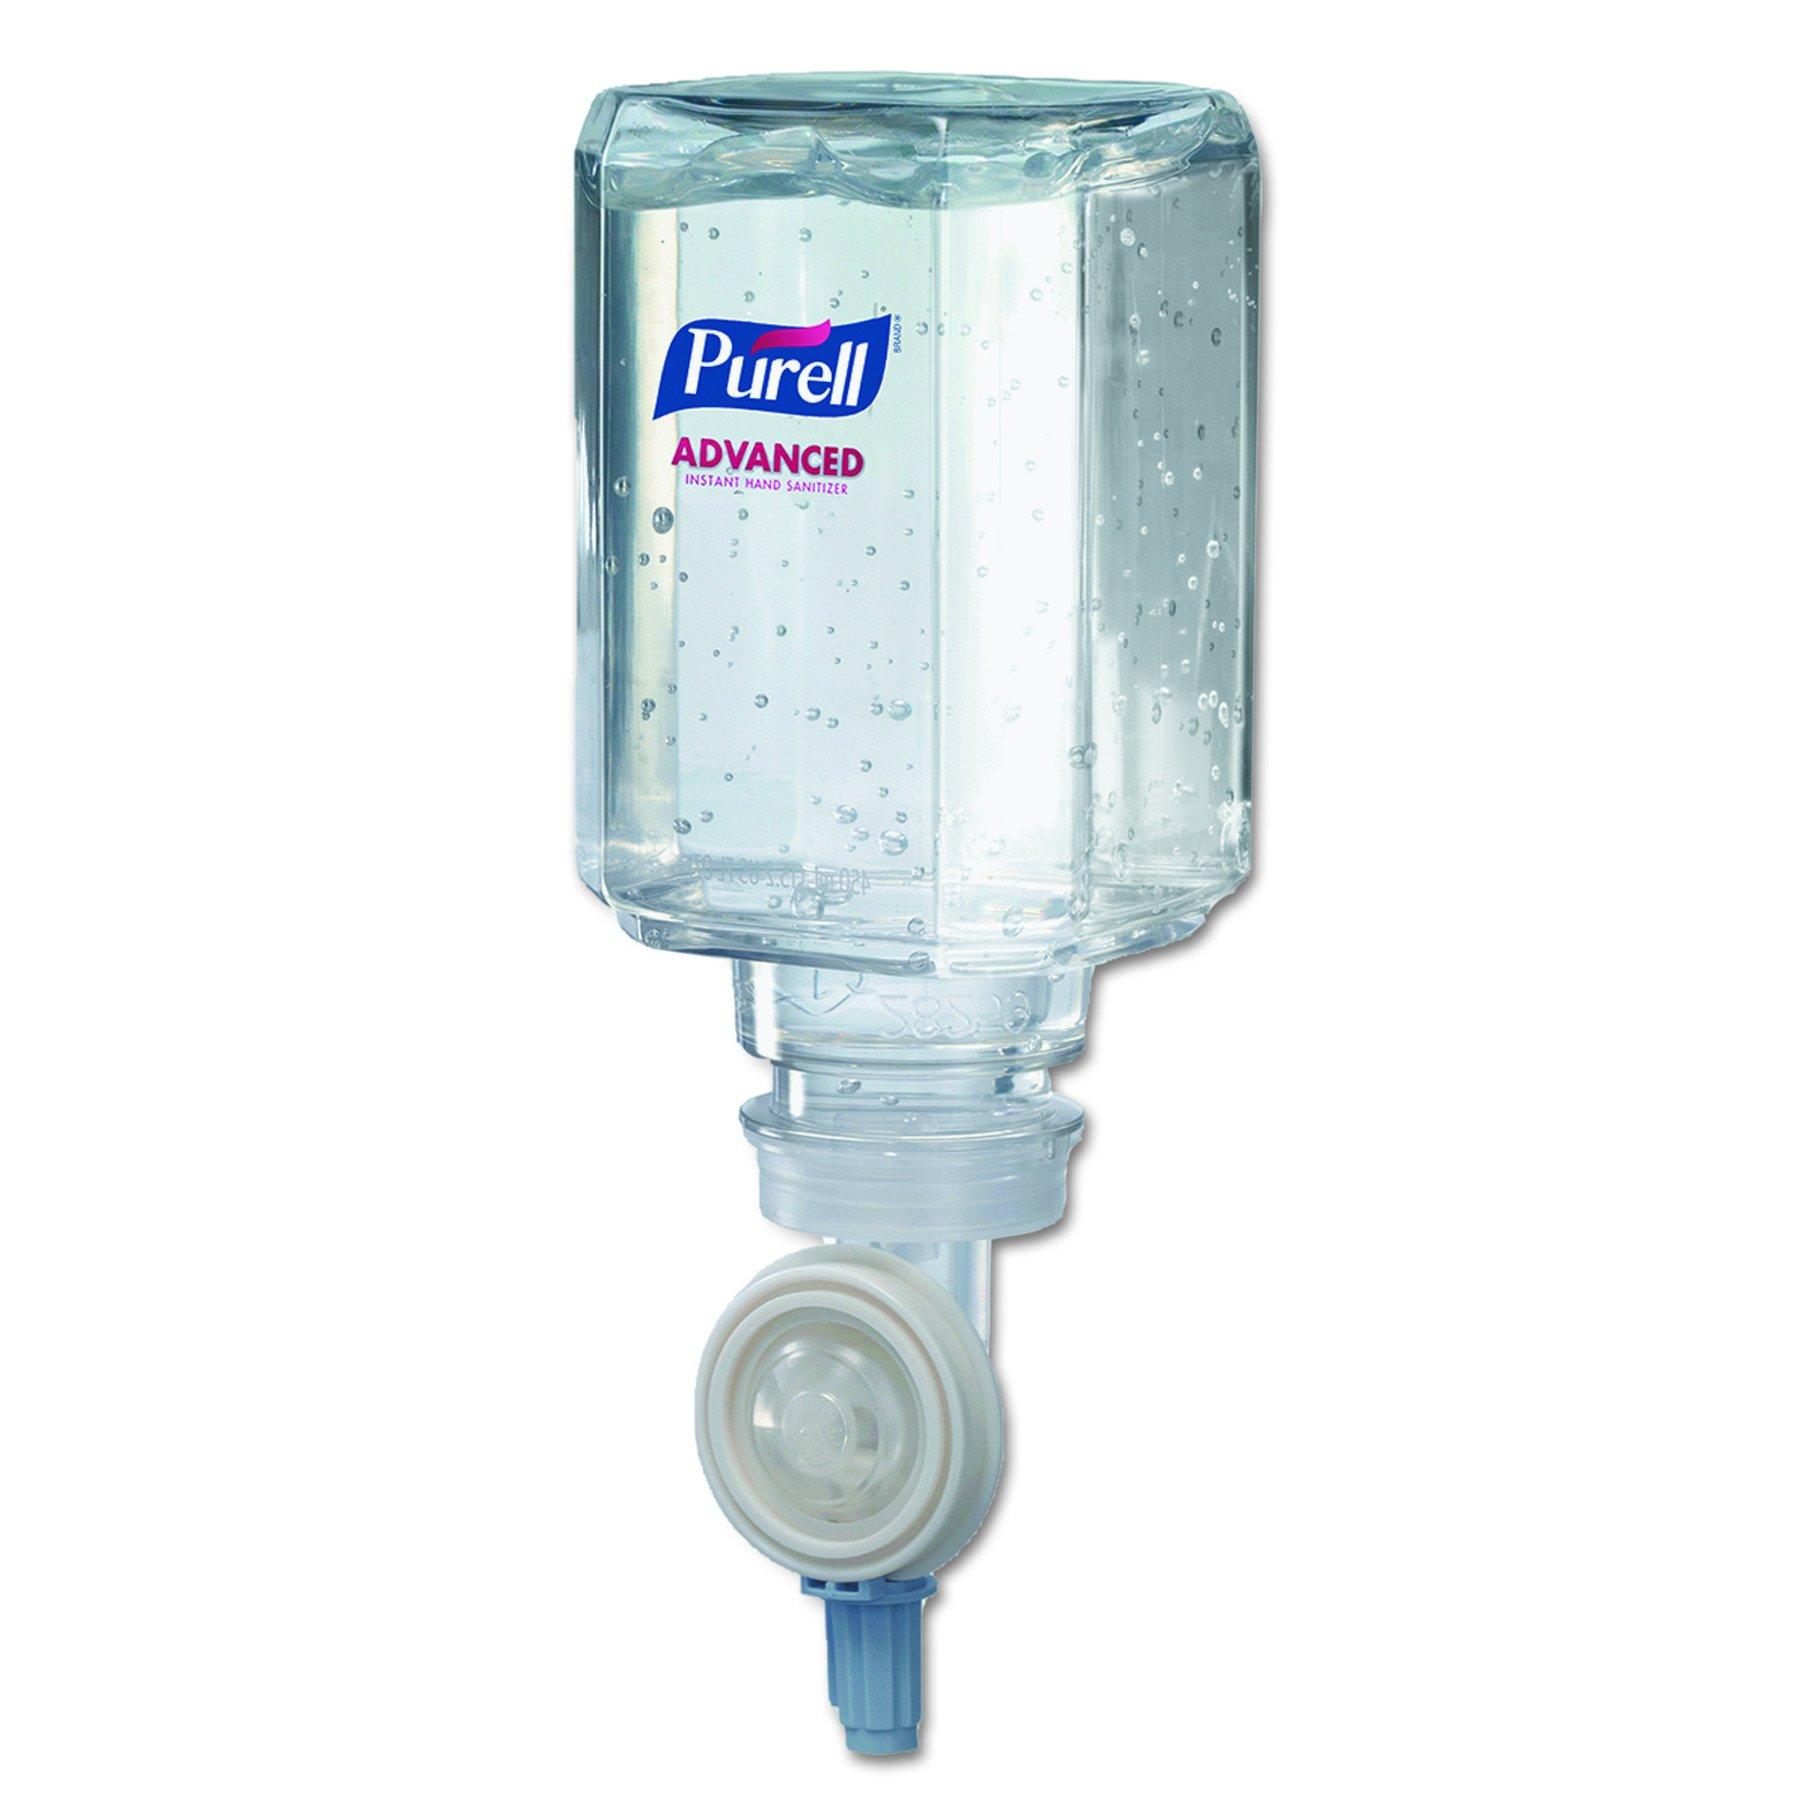 PURELL 1450082CT Advanced Instant Hand Sanitizer Gel, Lemon Scent, 450 mL Refill (Case of 16)